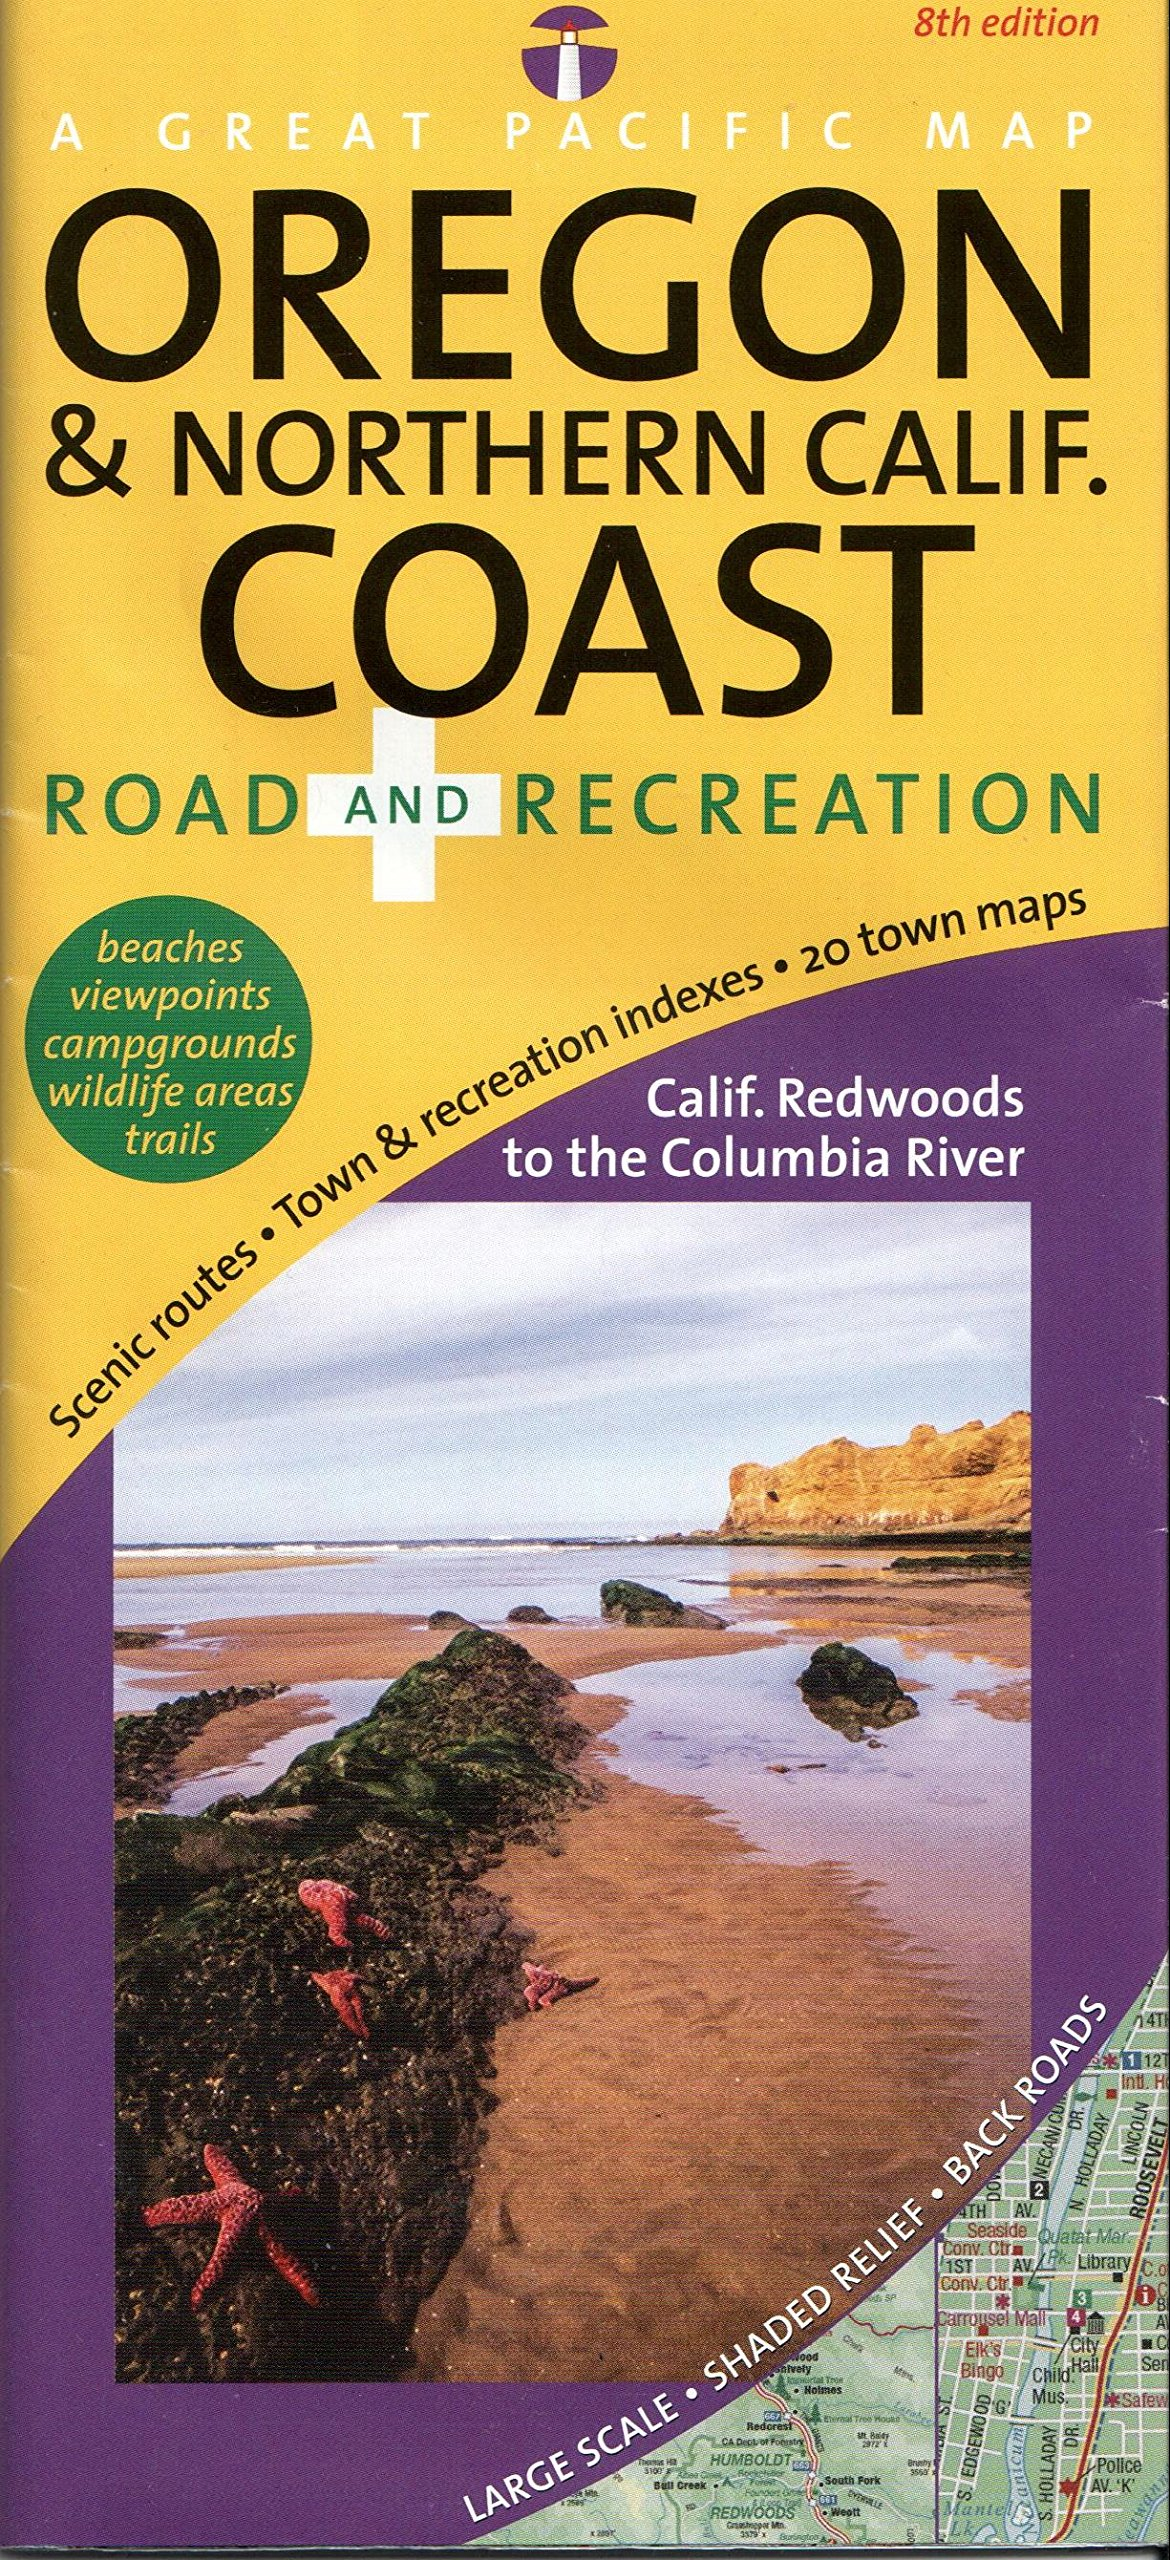 Oregon Northern California Coast Road Recreation Map Th - Map of oregon and california coast